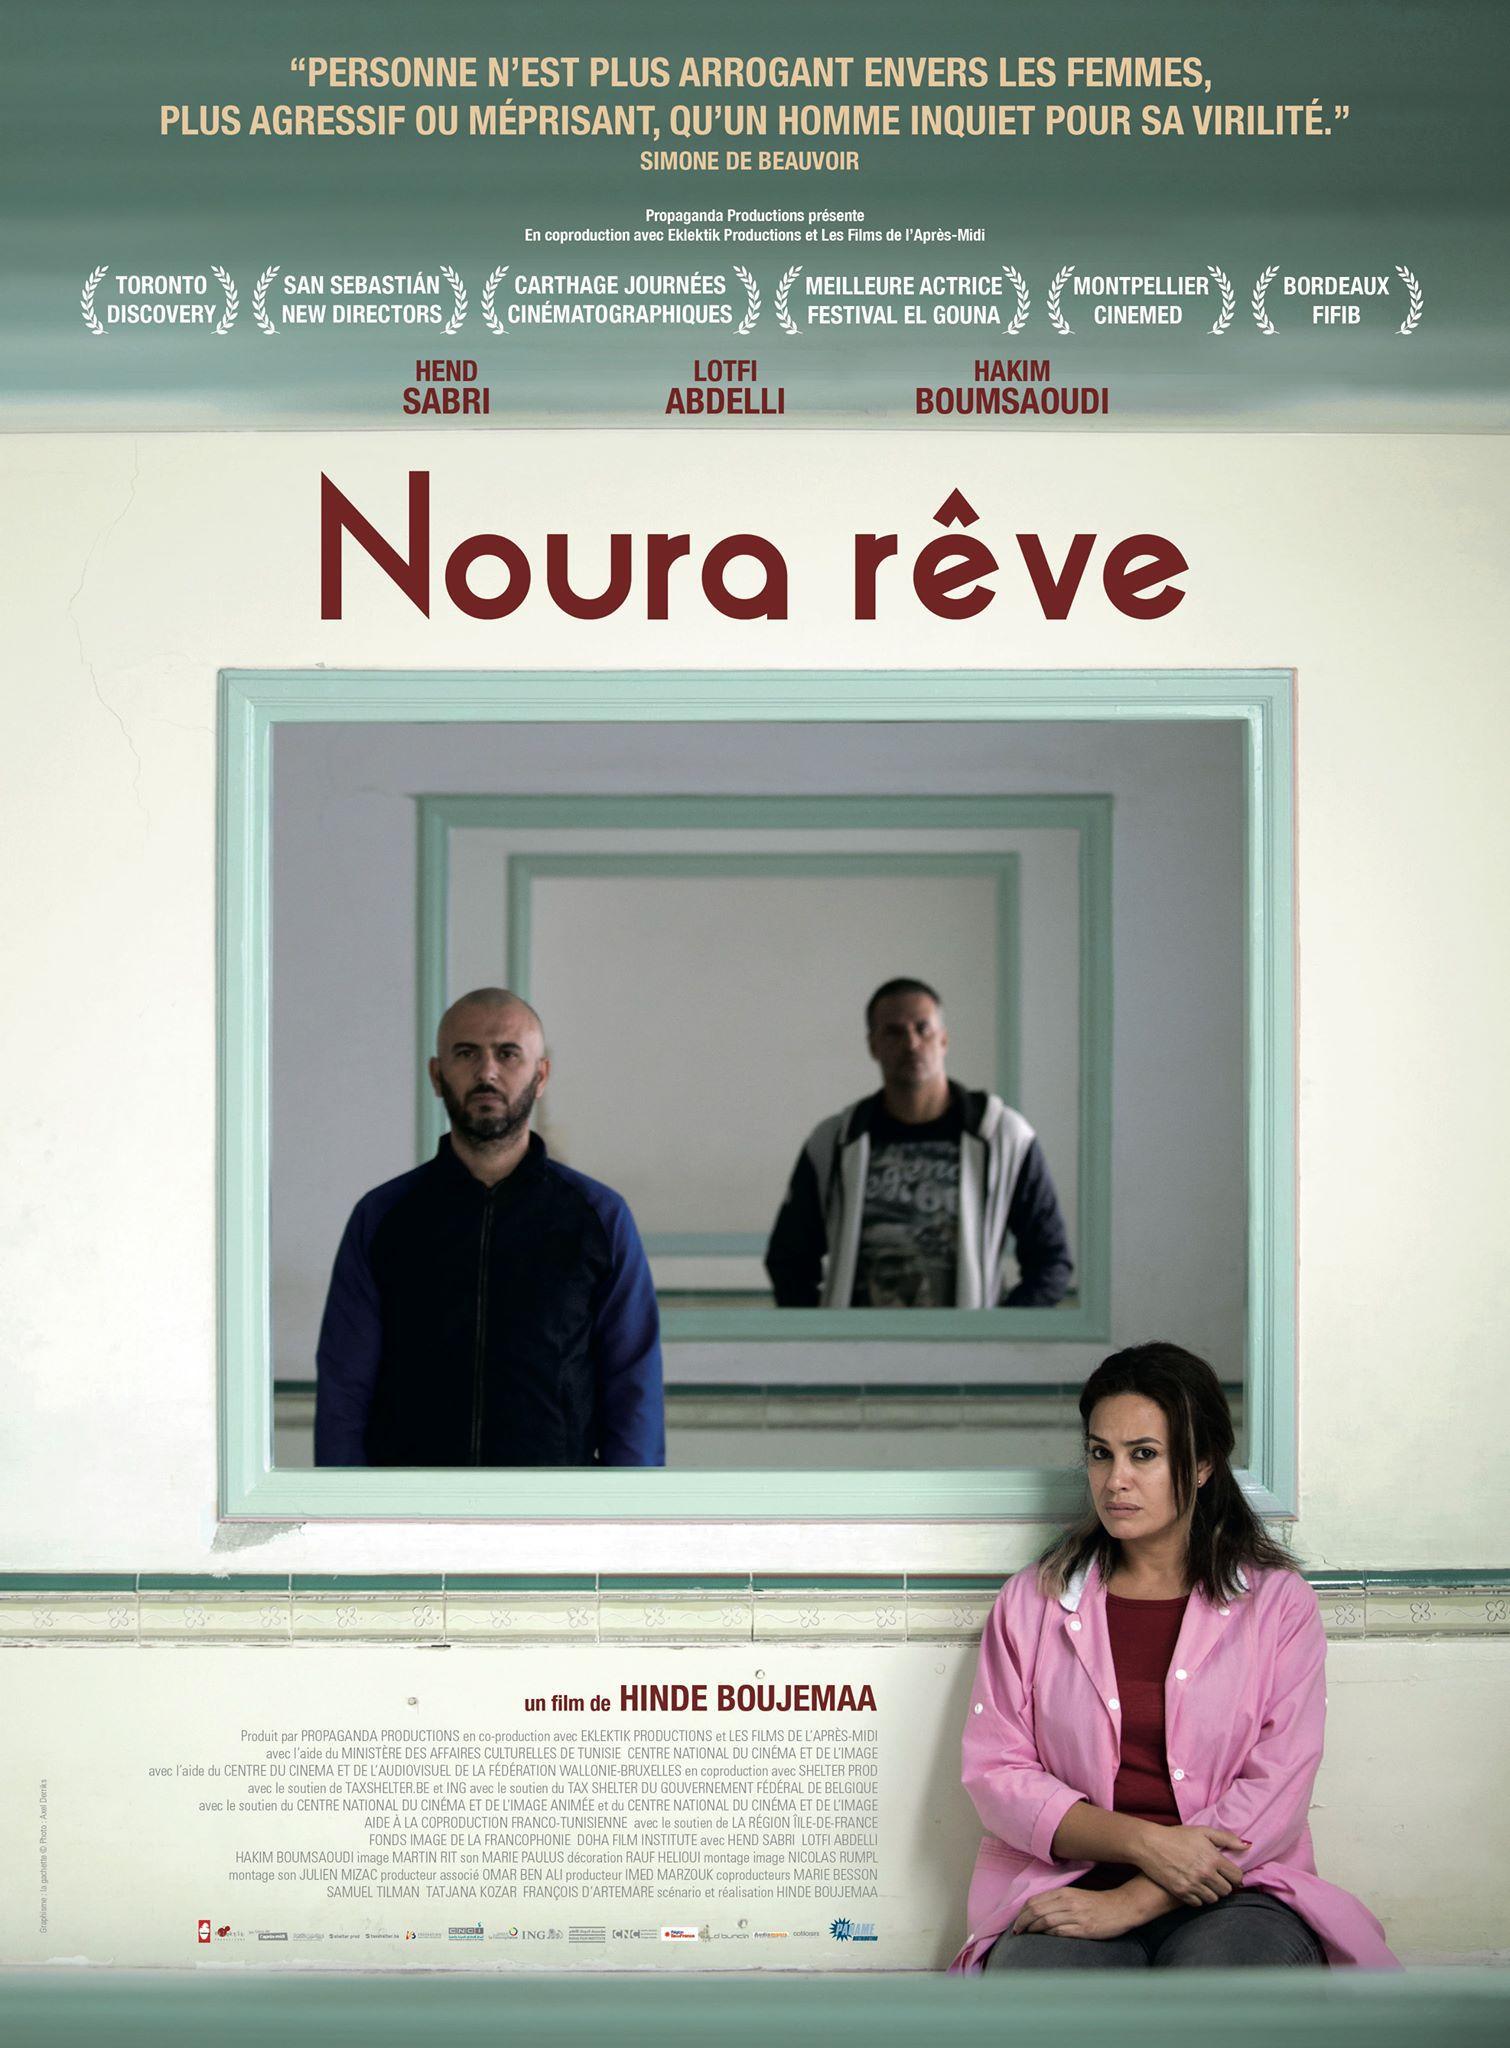 Noura rêve - Film (2019)